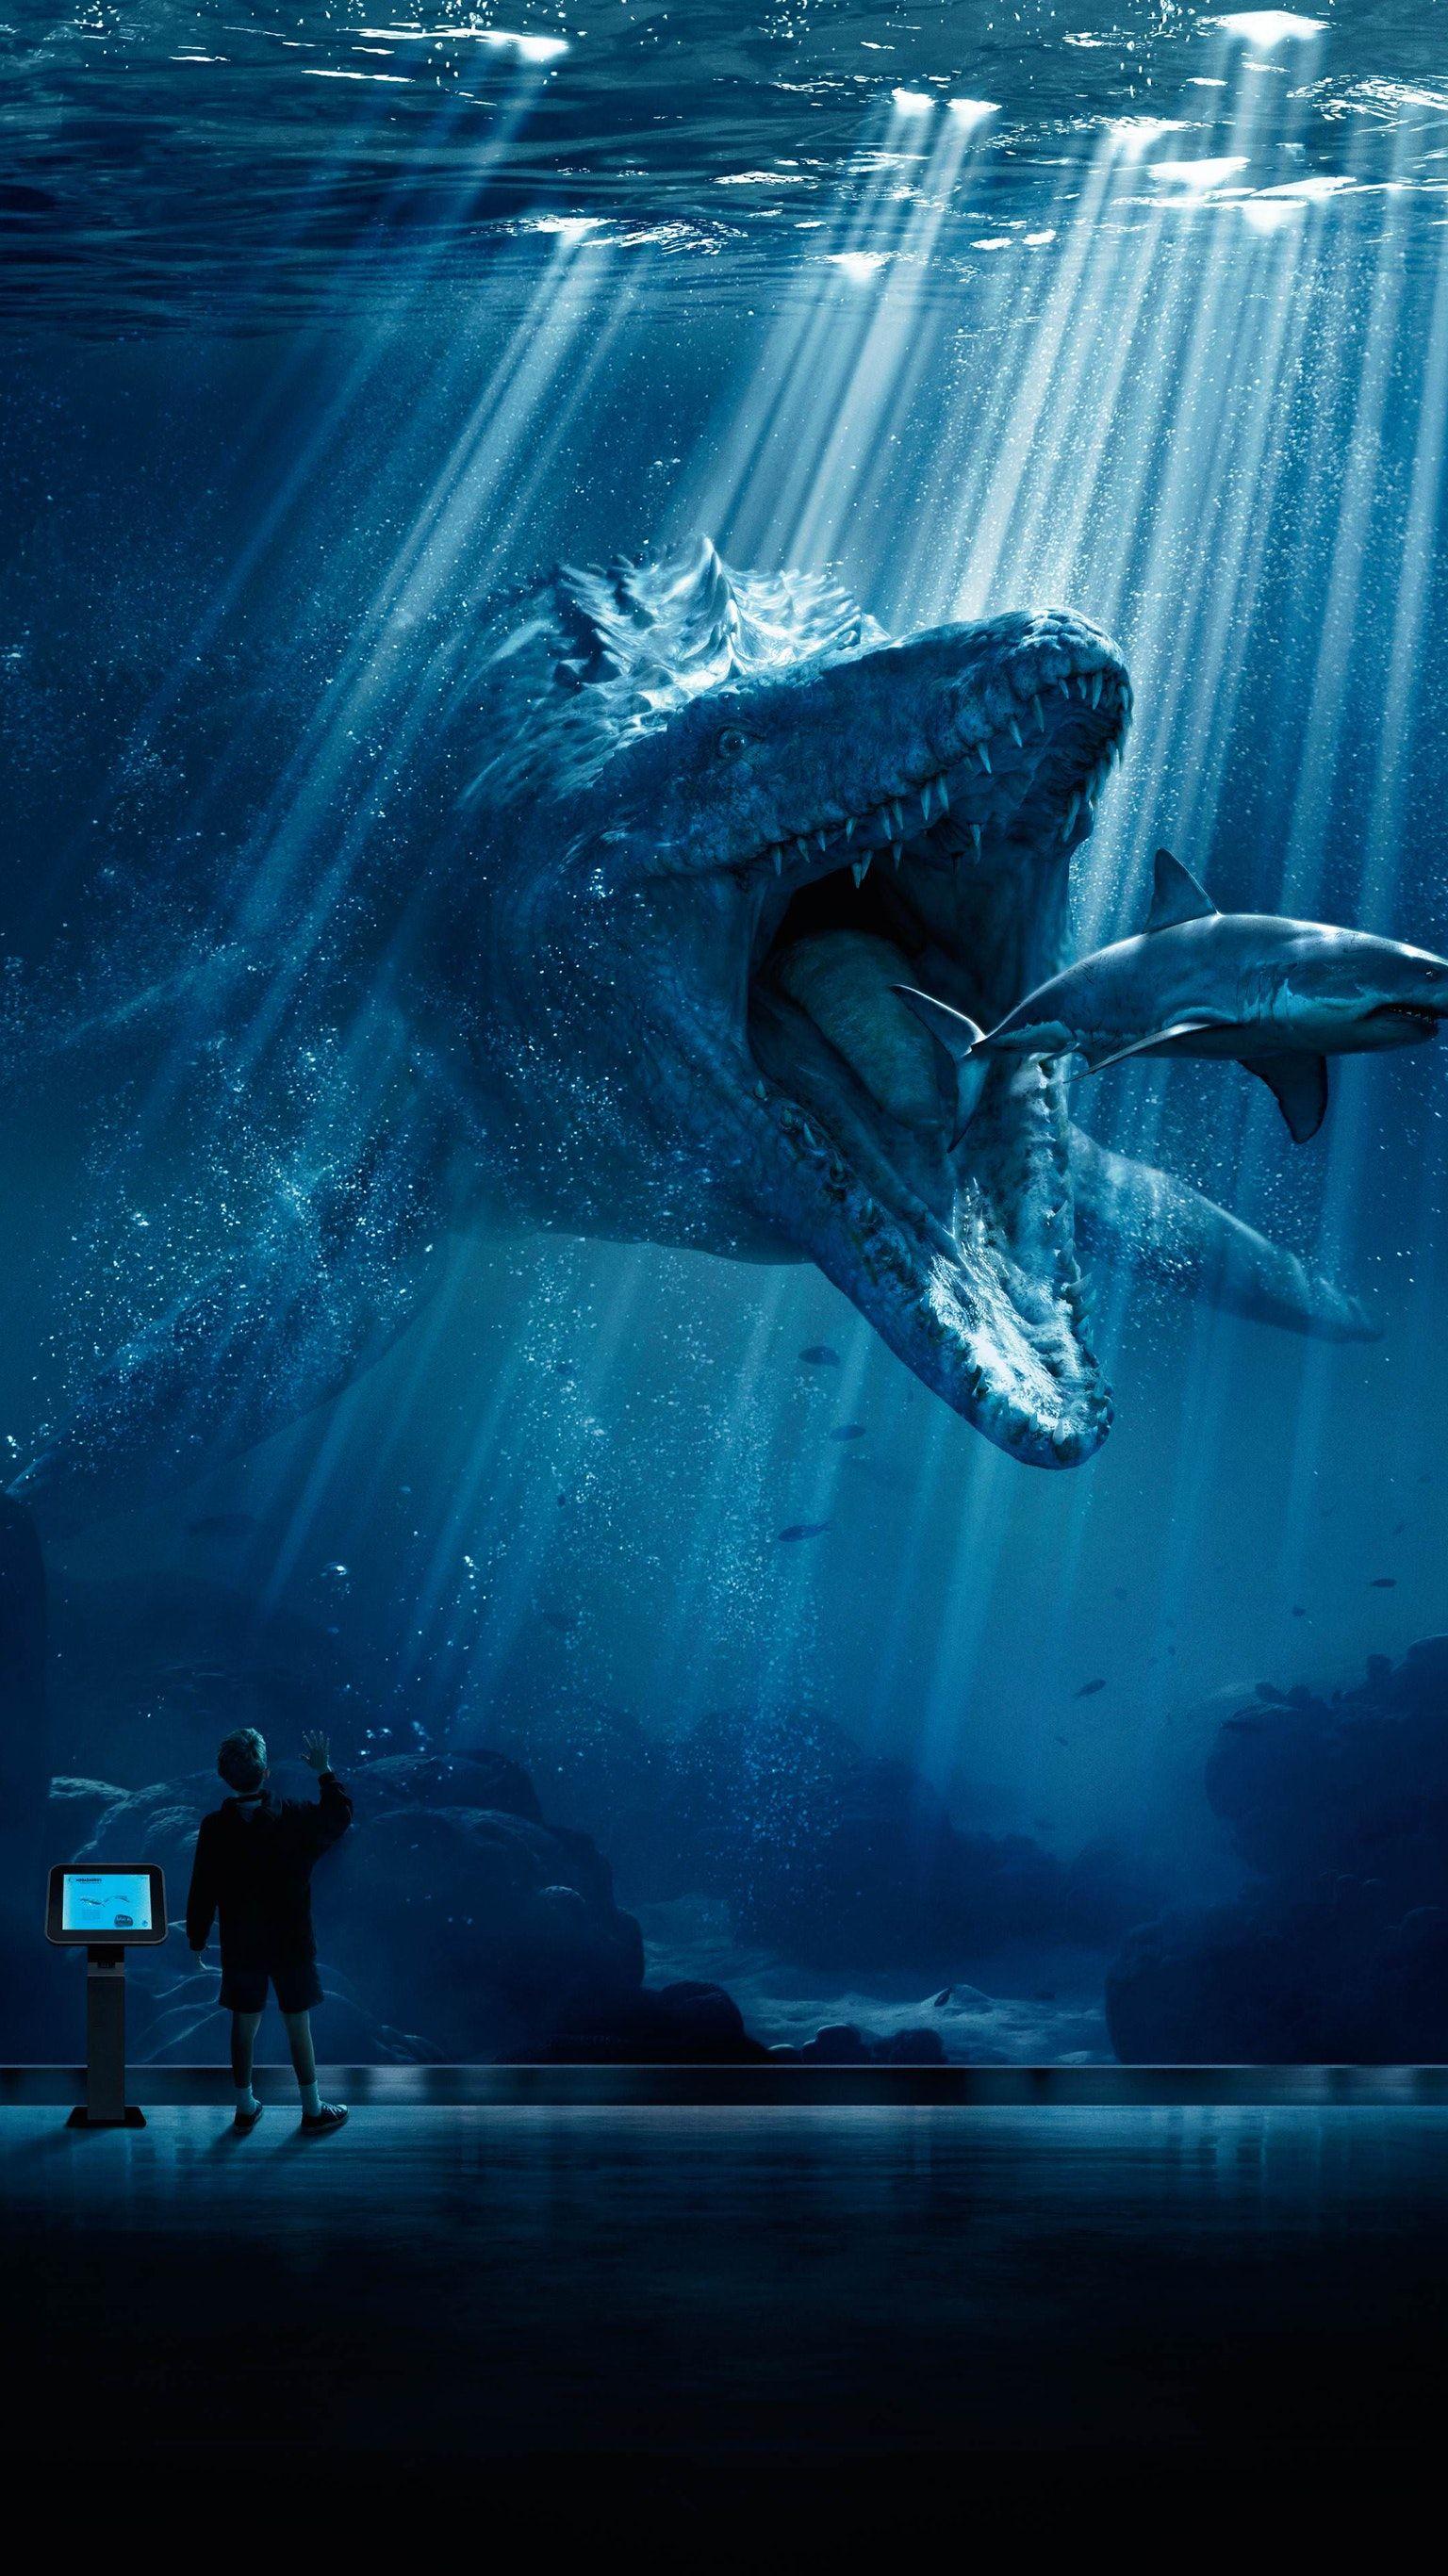 Jurassic World (2015) Phone Wallpaper Jurassic world